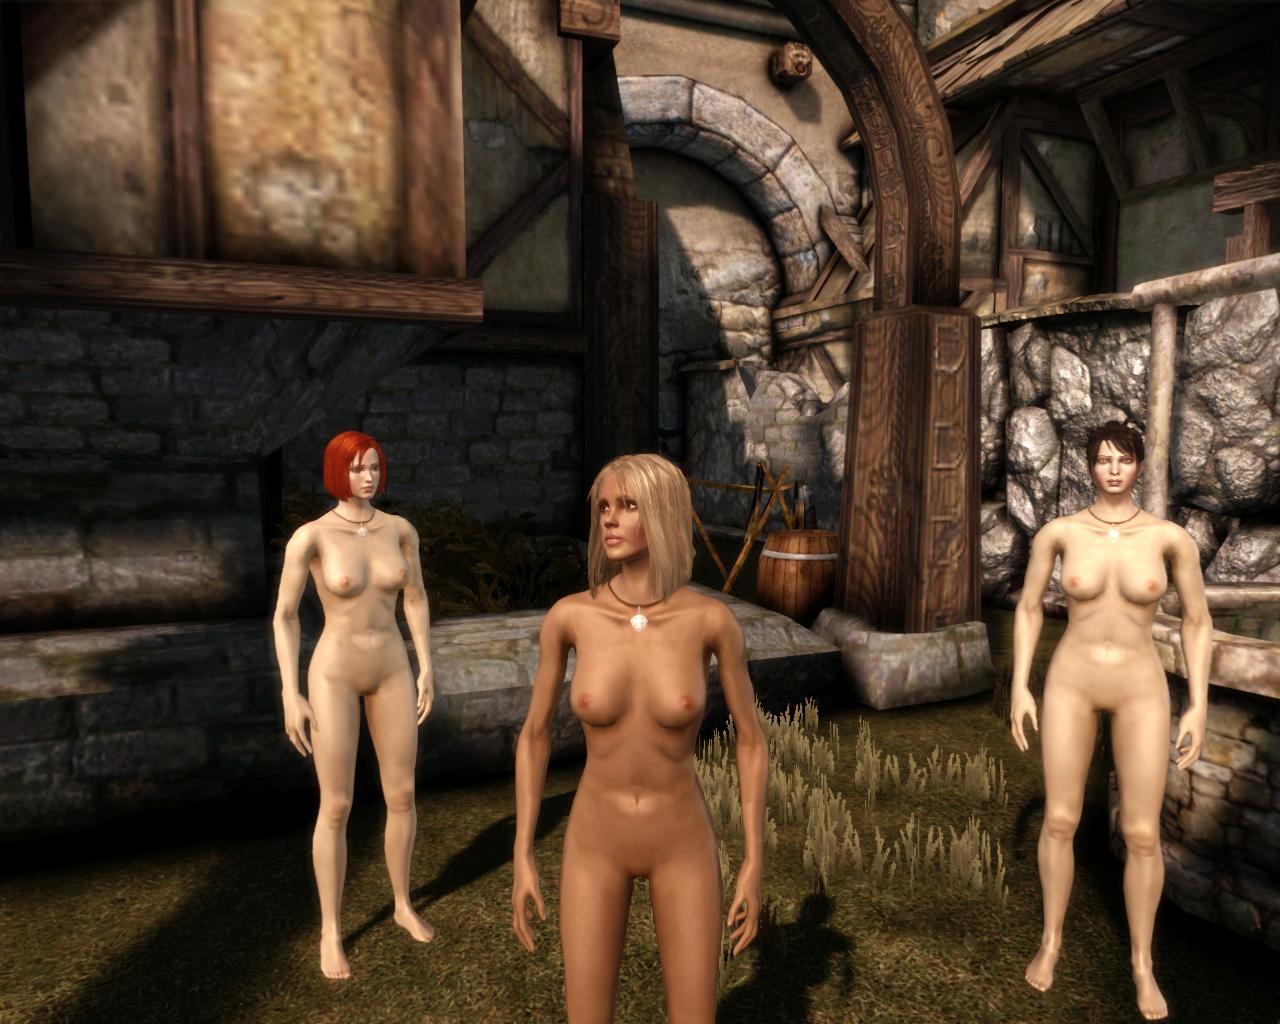 demon age dragon origins desire Artist: nobody in particular